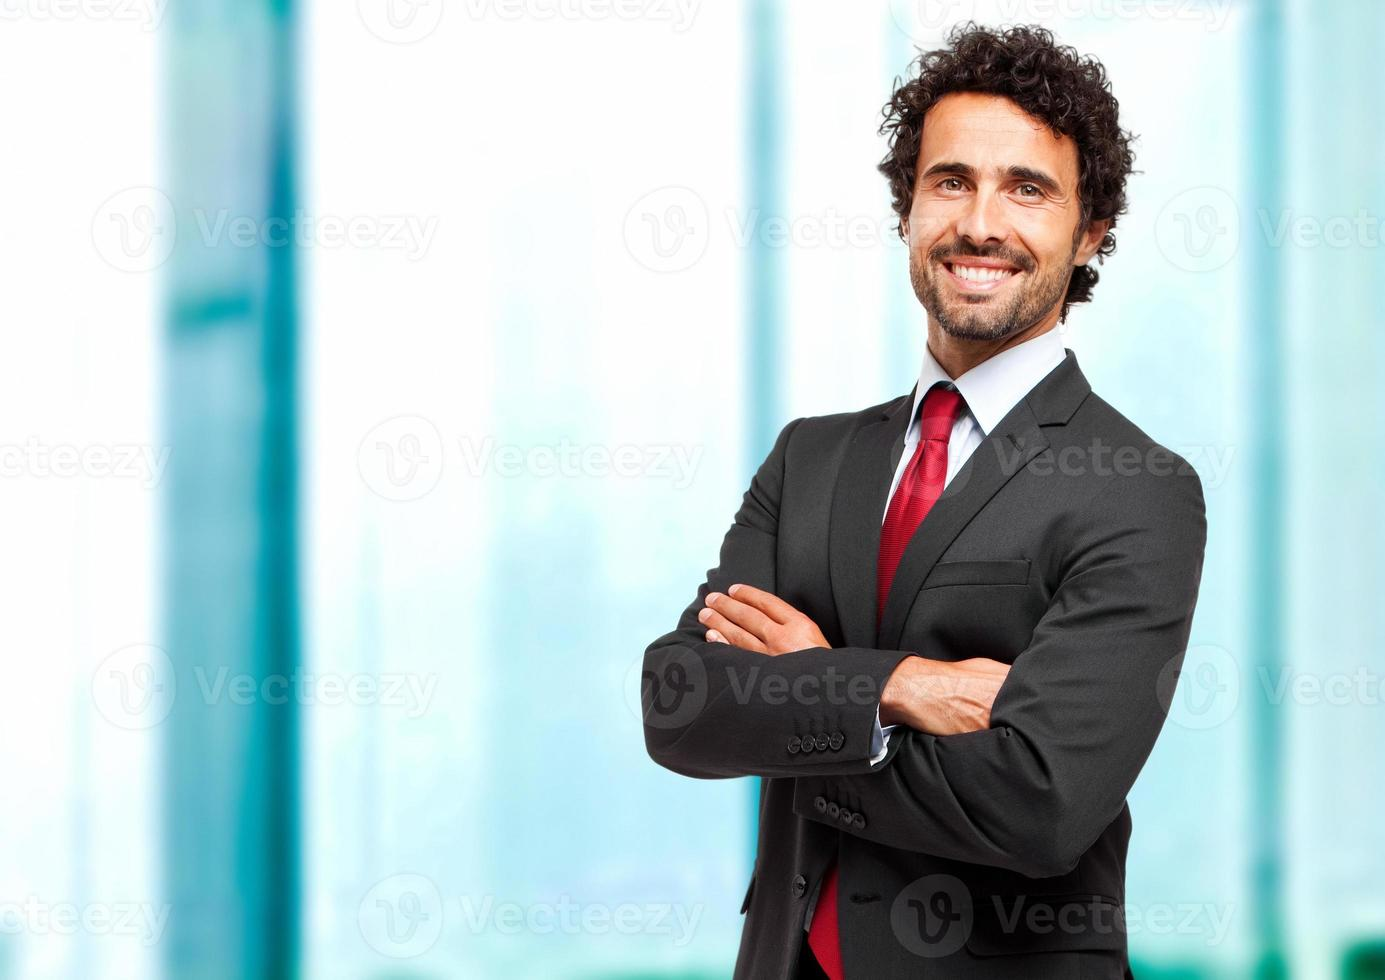 gerente masculino confiante foto